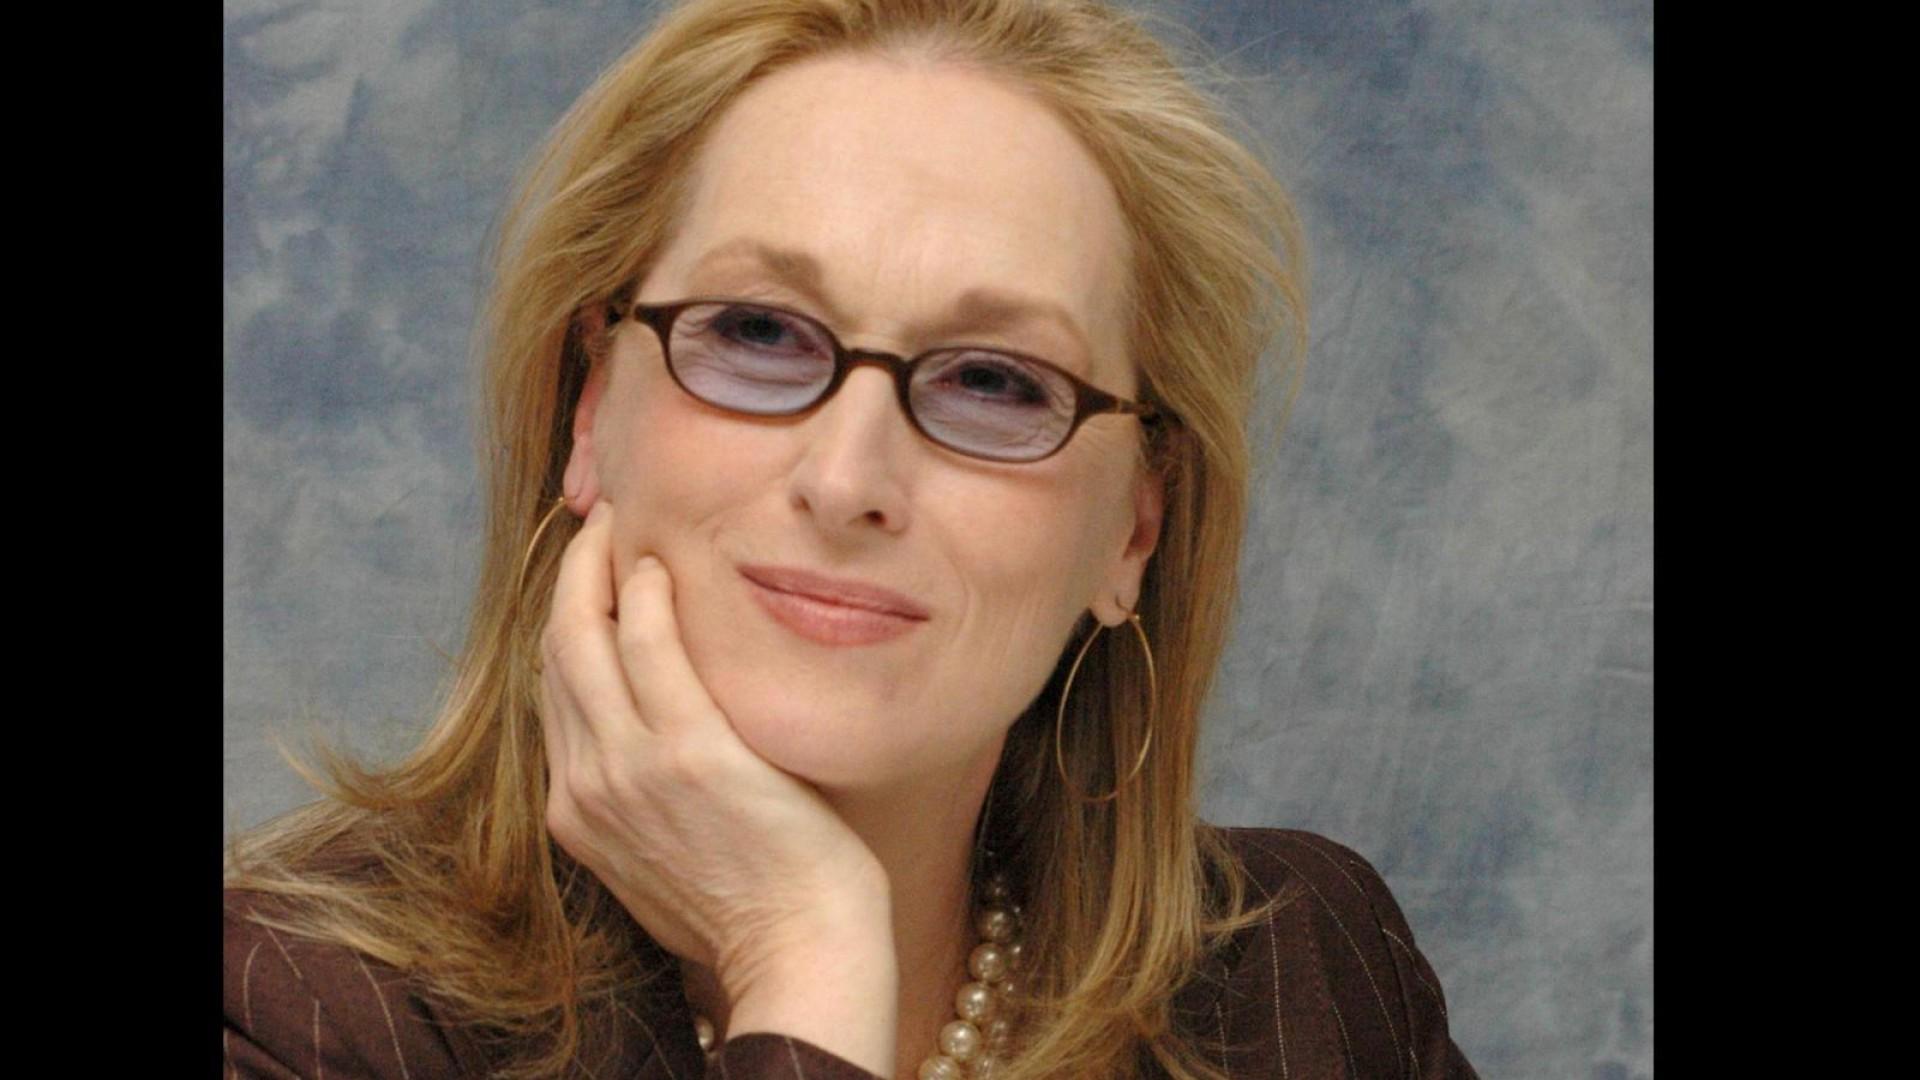 Meryl Streep HQ wallpapers